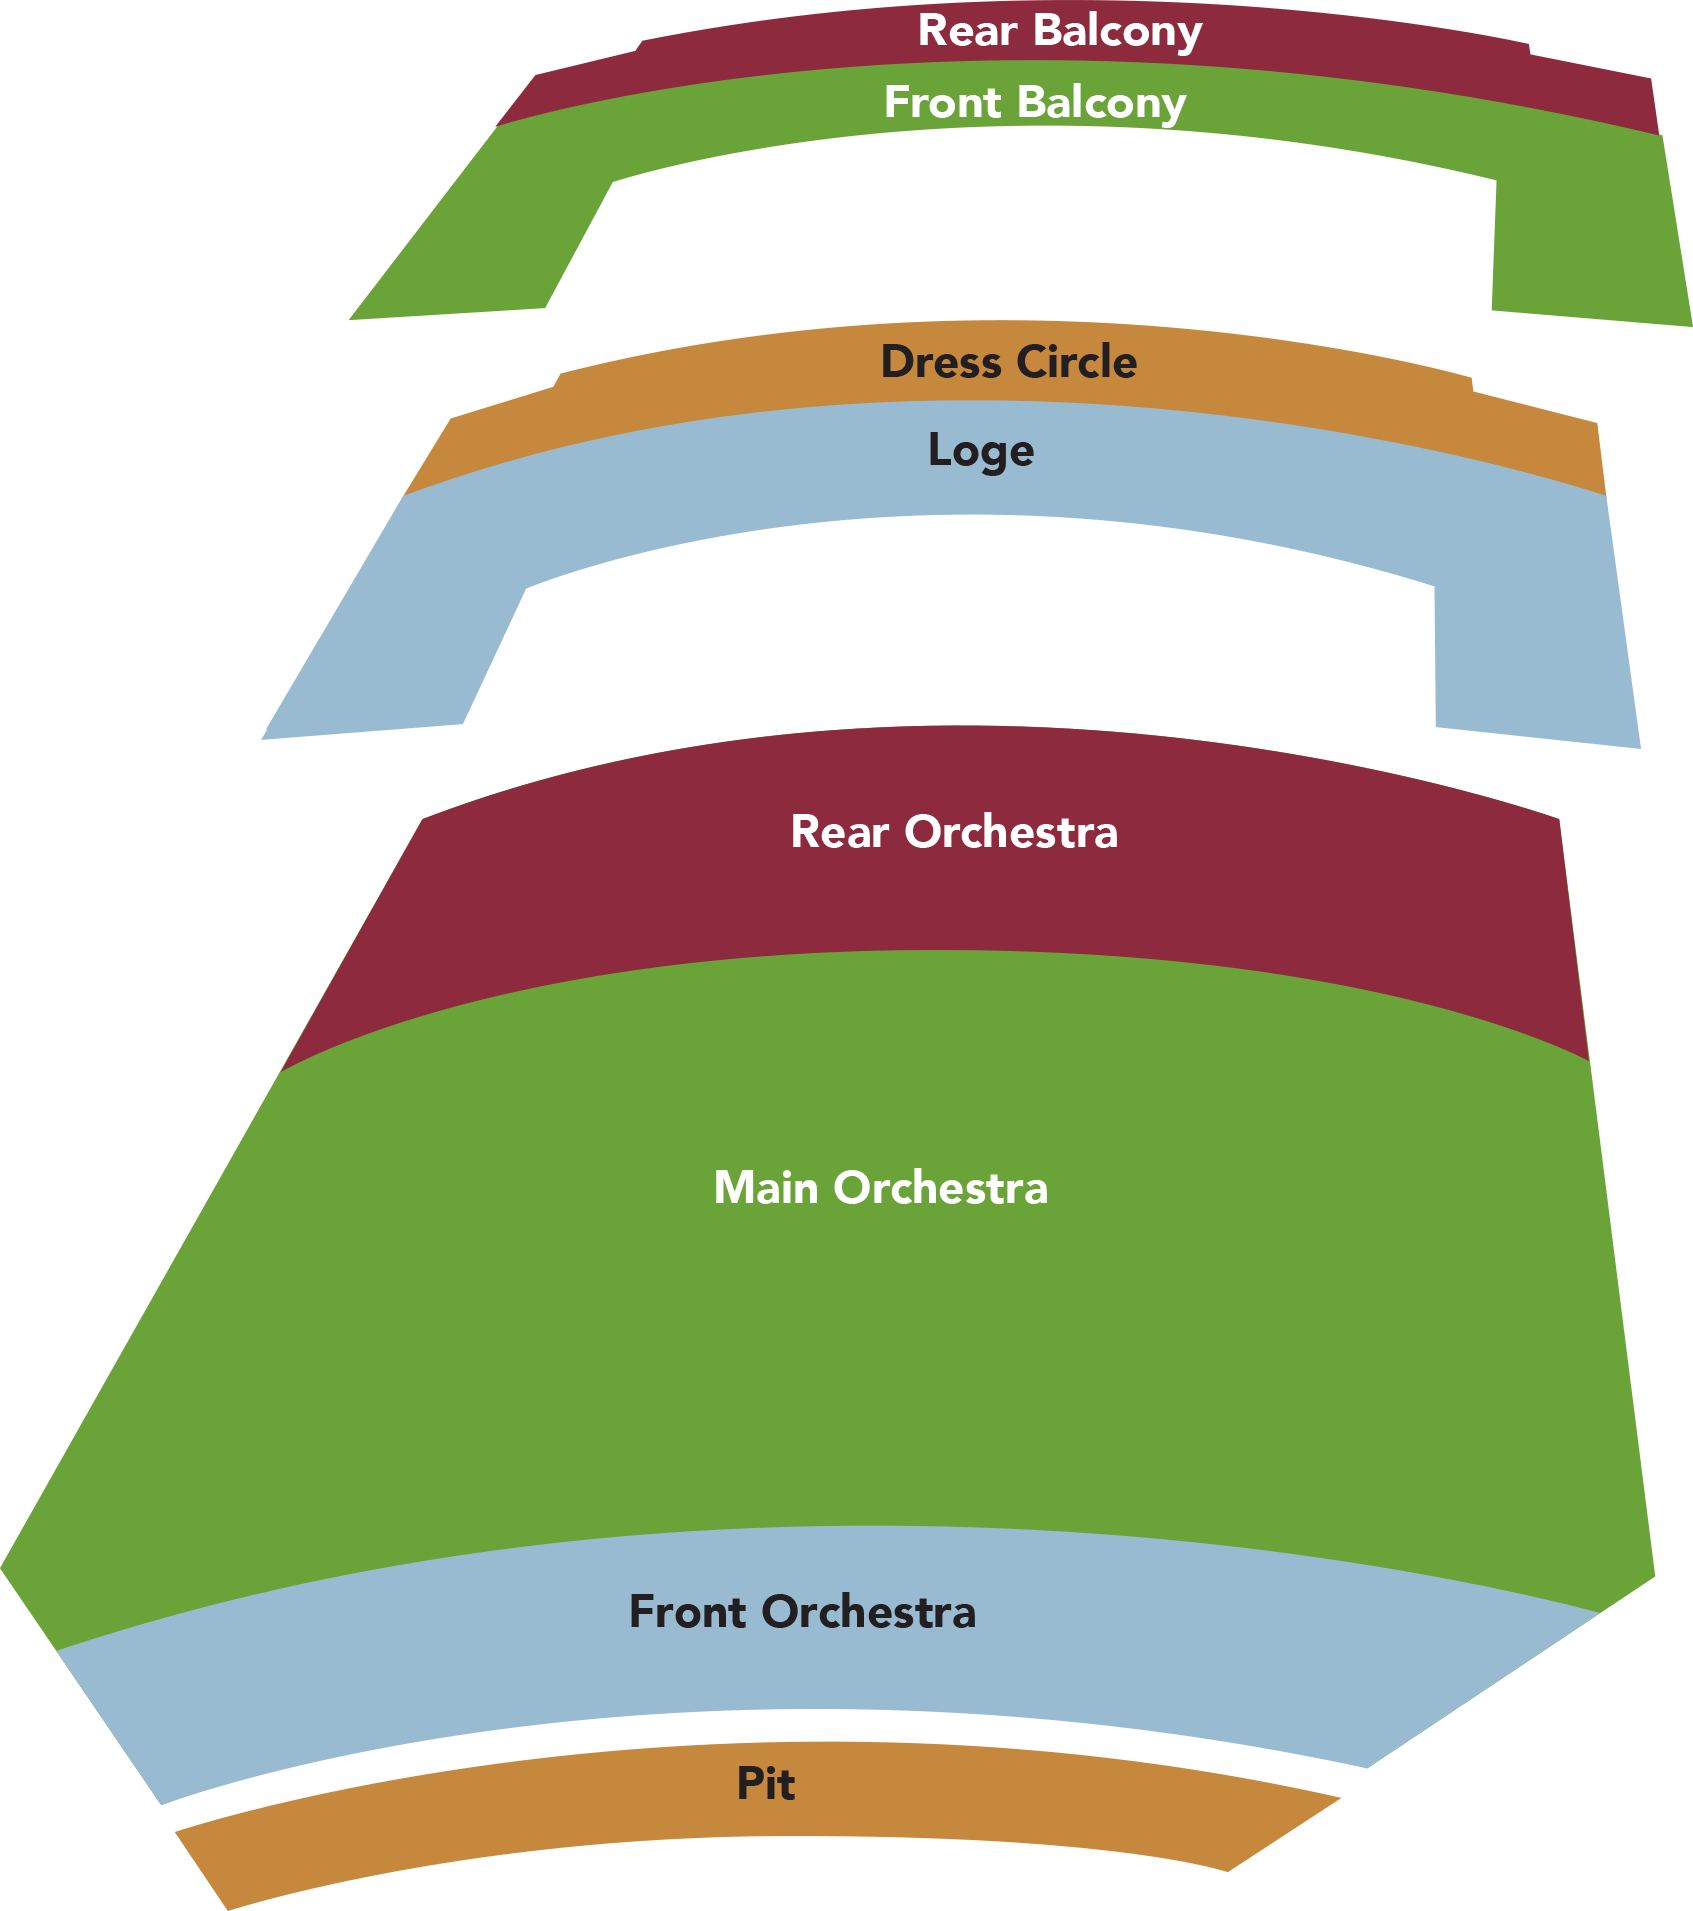 2020 Seat Map